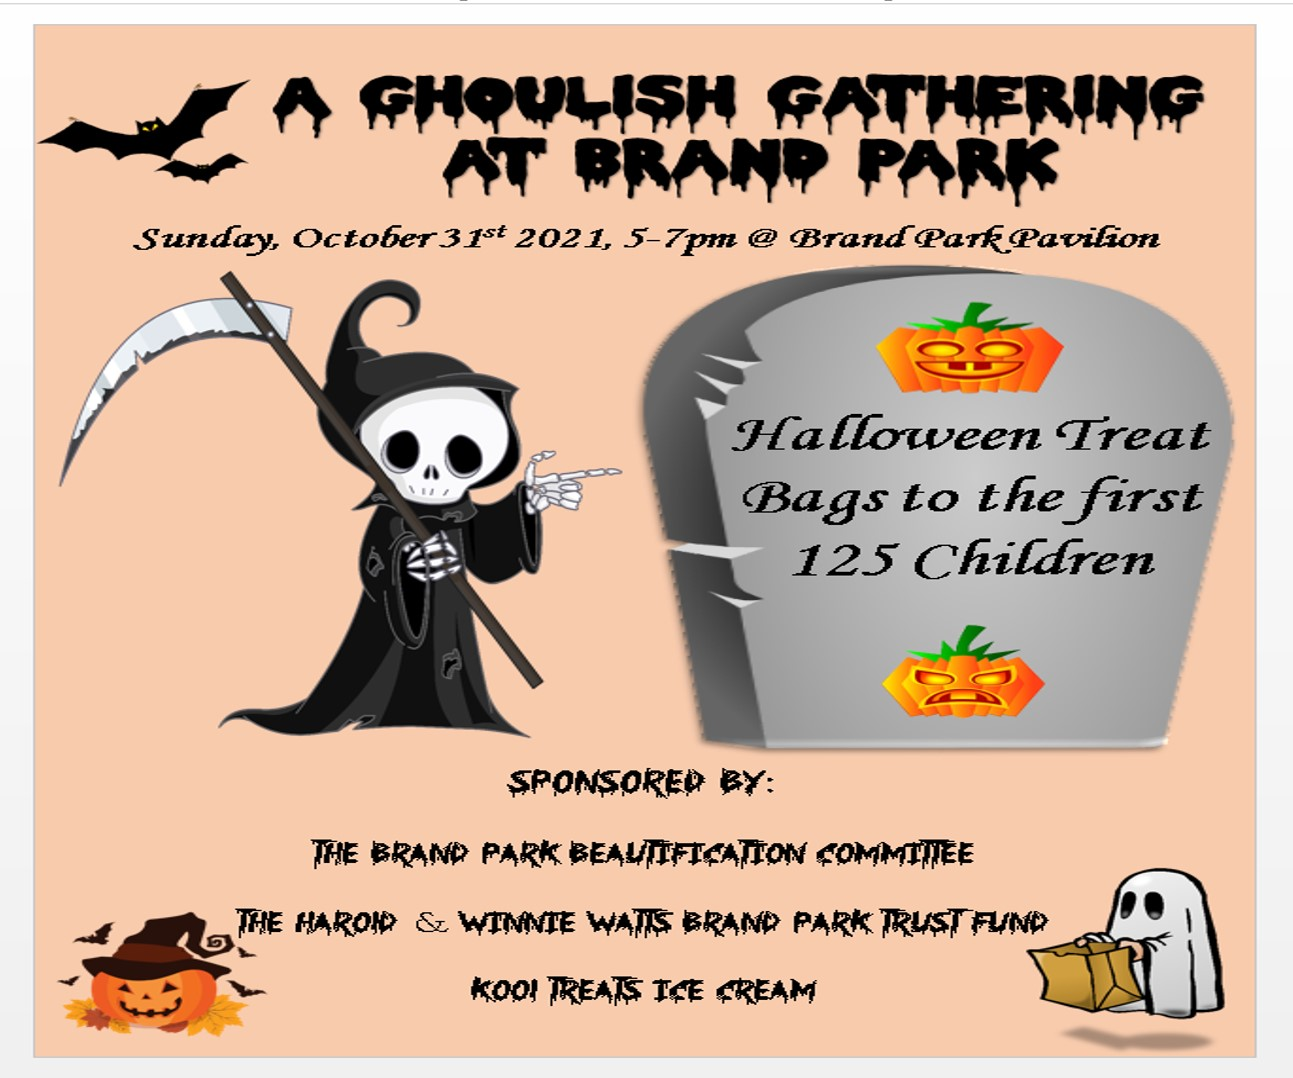 Ghoulish Gathering at Brand Park